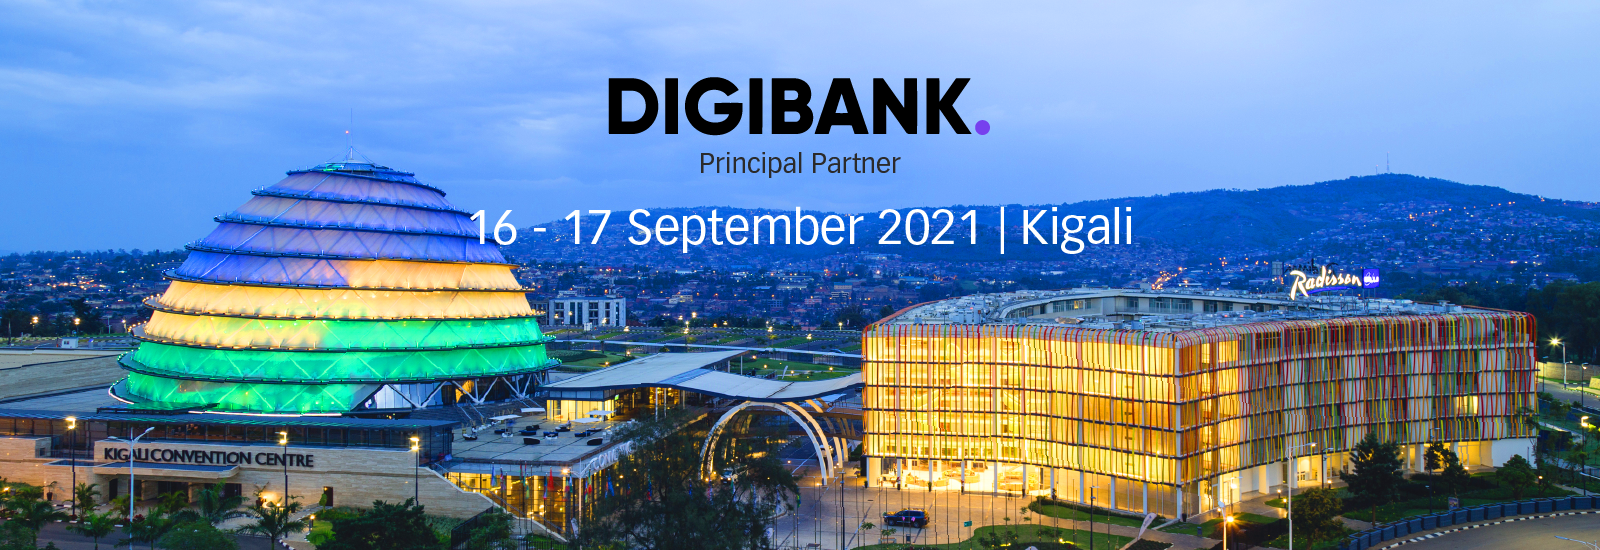 ProgressSoft, 2021 Kigali DigiBank Afrika Zirvesi'nde